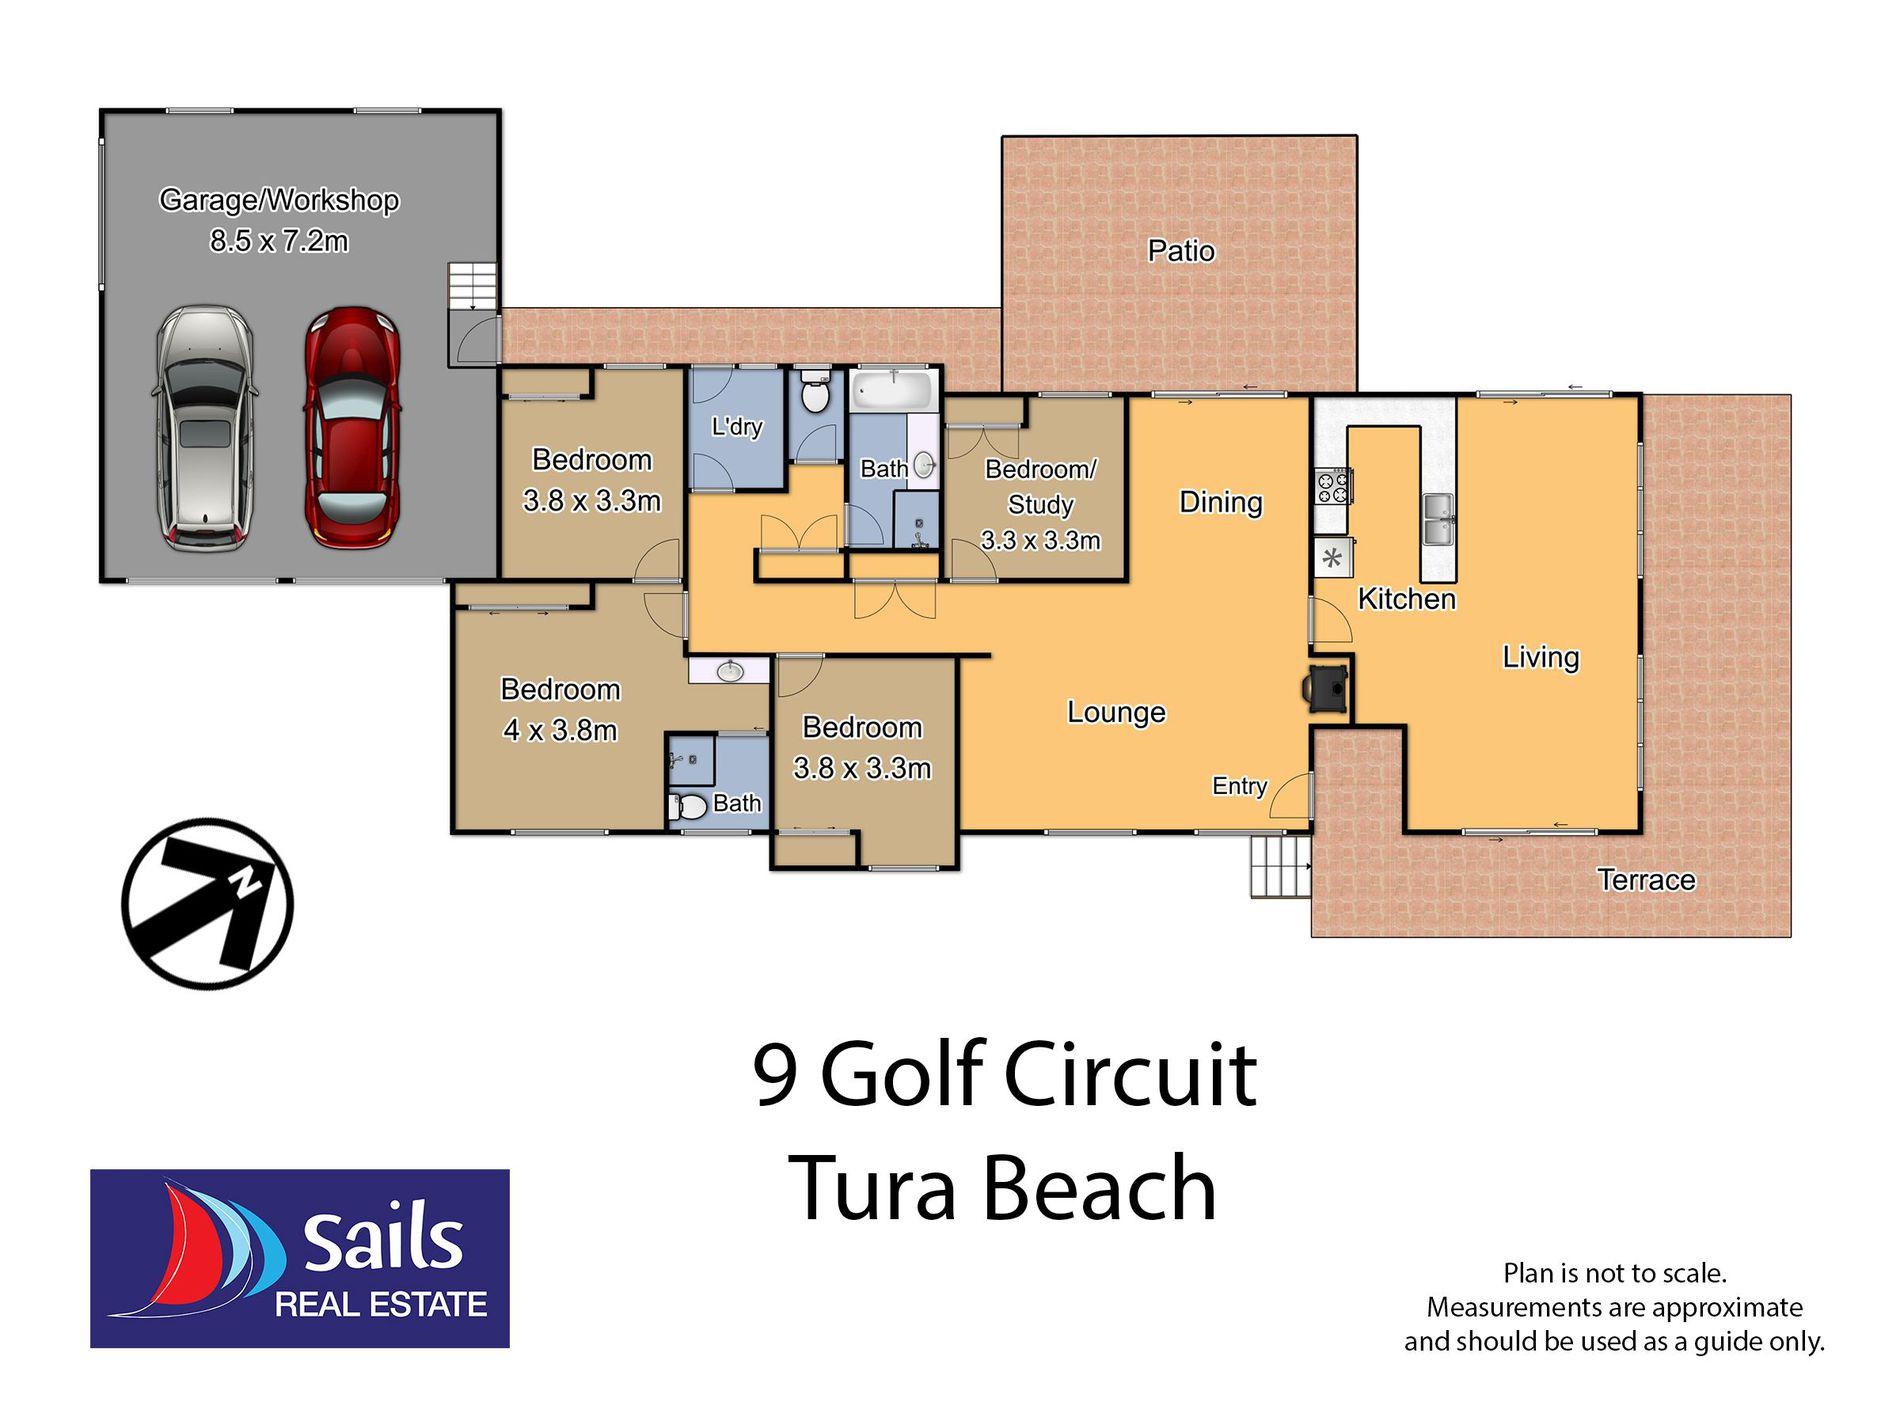 9 Golf Circuit, Tura Beach